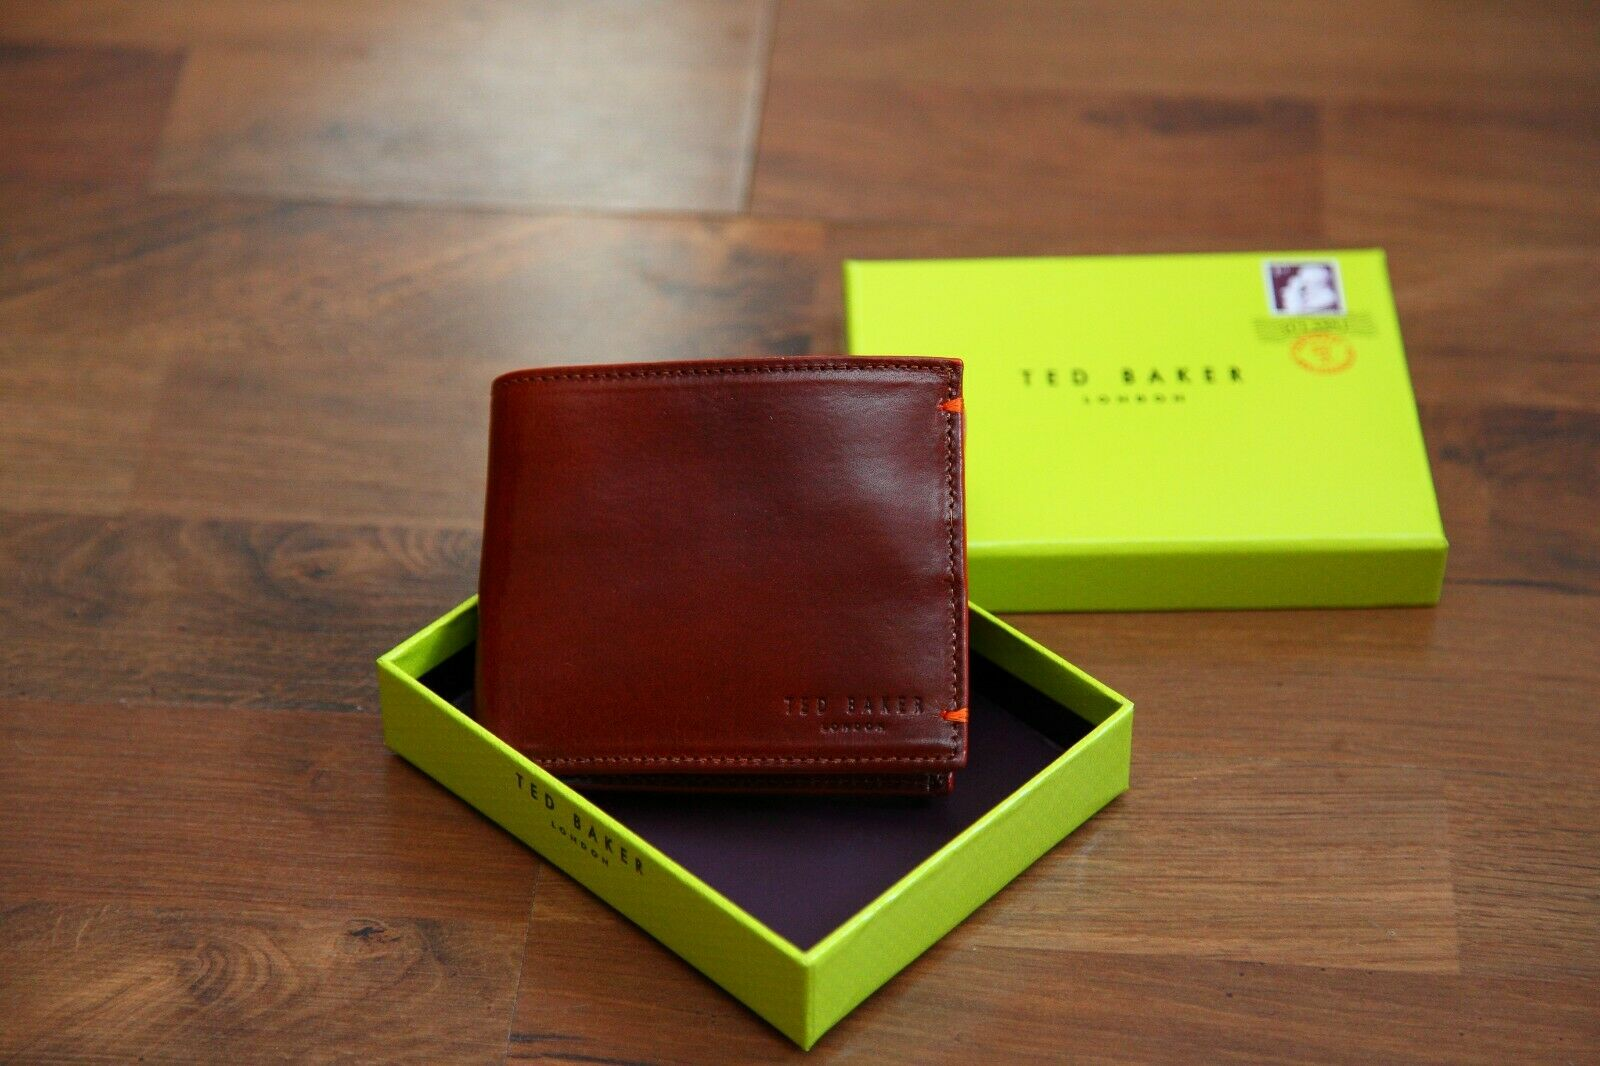 Ted Baker Douglex Edge paint Bifold Tan Leather Wallet BNWT